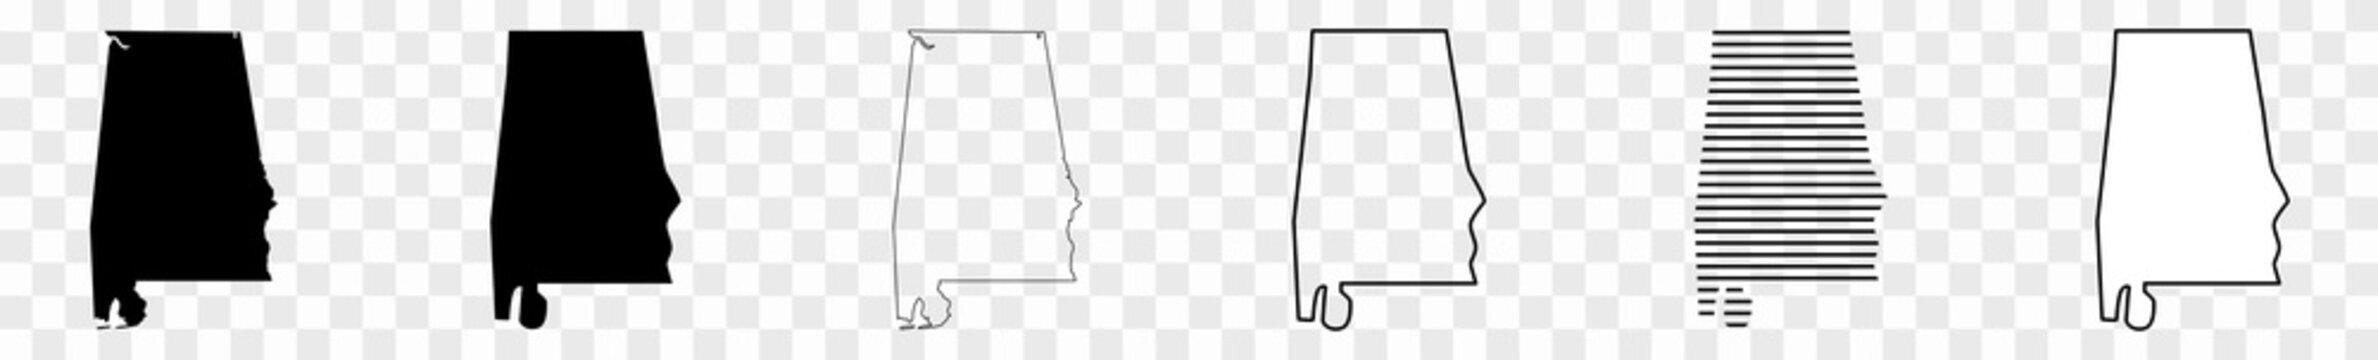 Alabama Map Black | State Border | United States | US America | Transparent Isolated | Variations